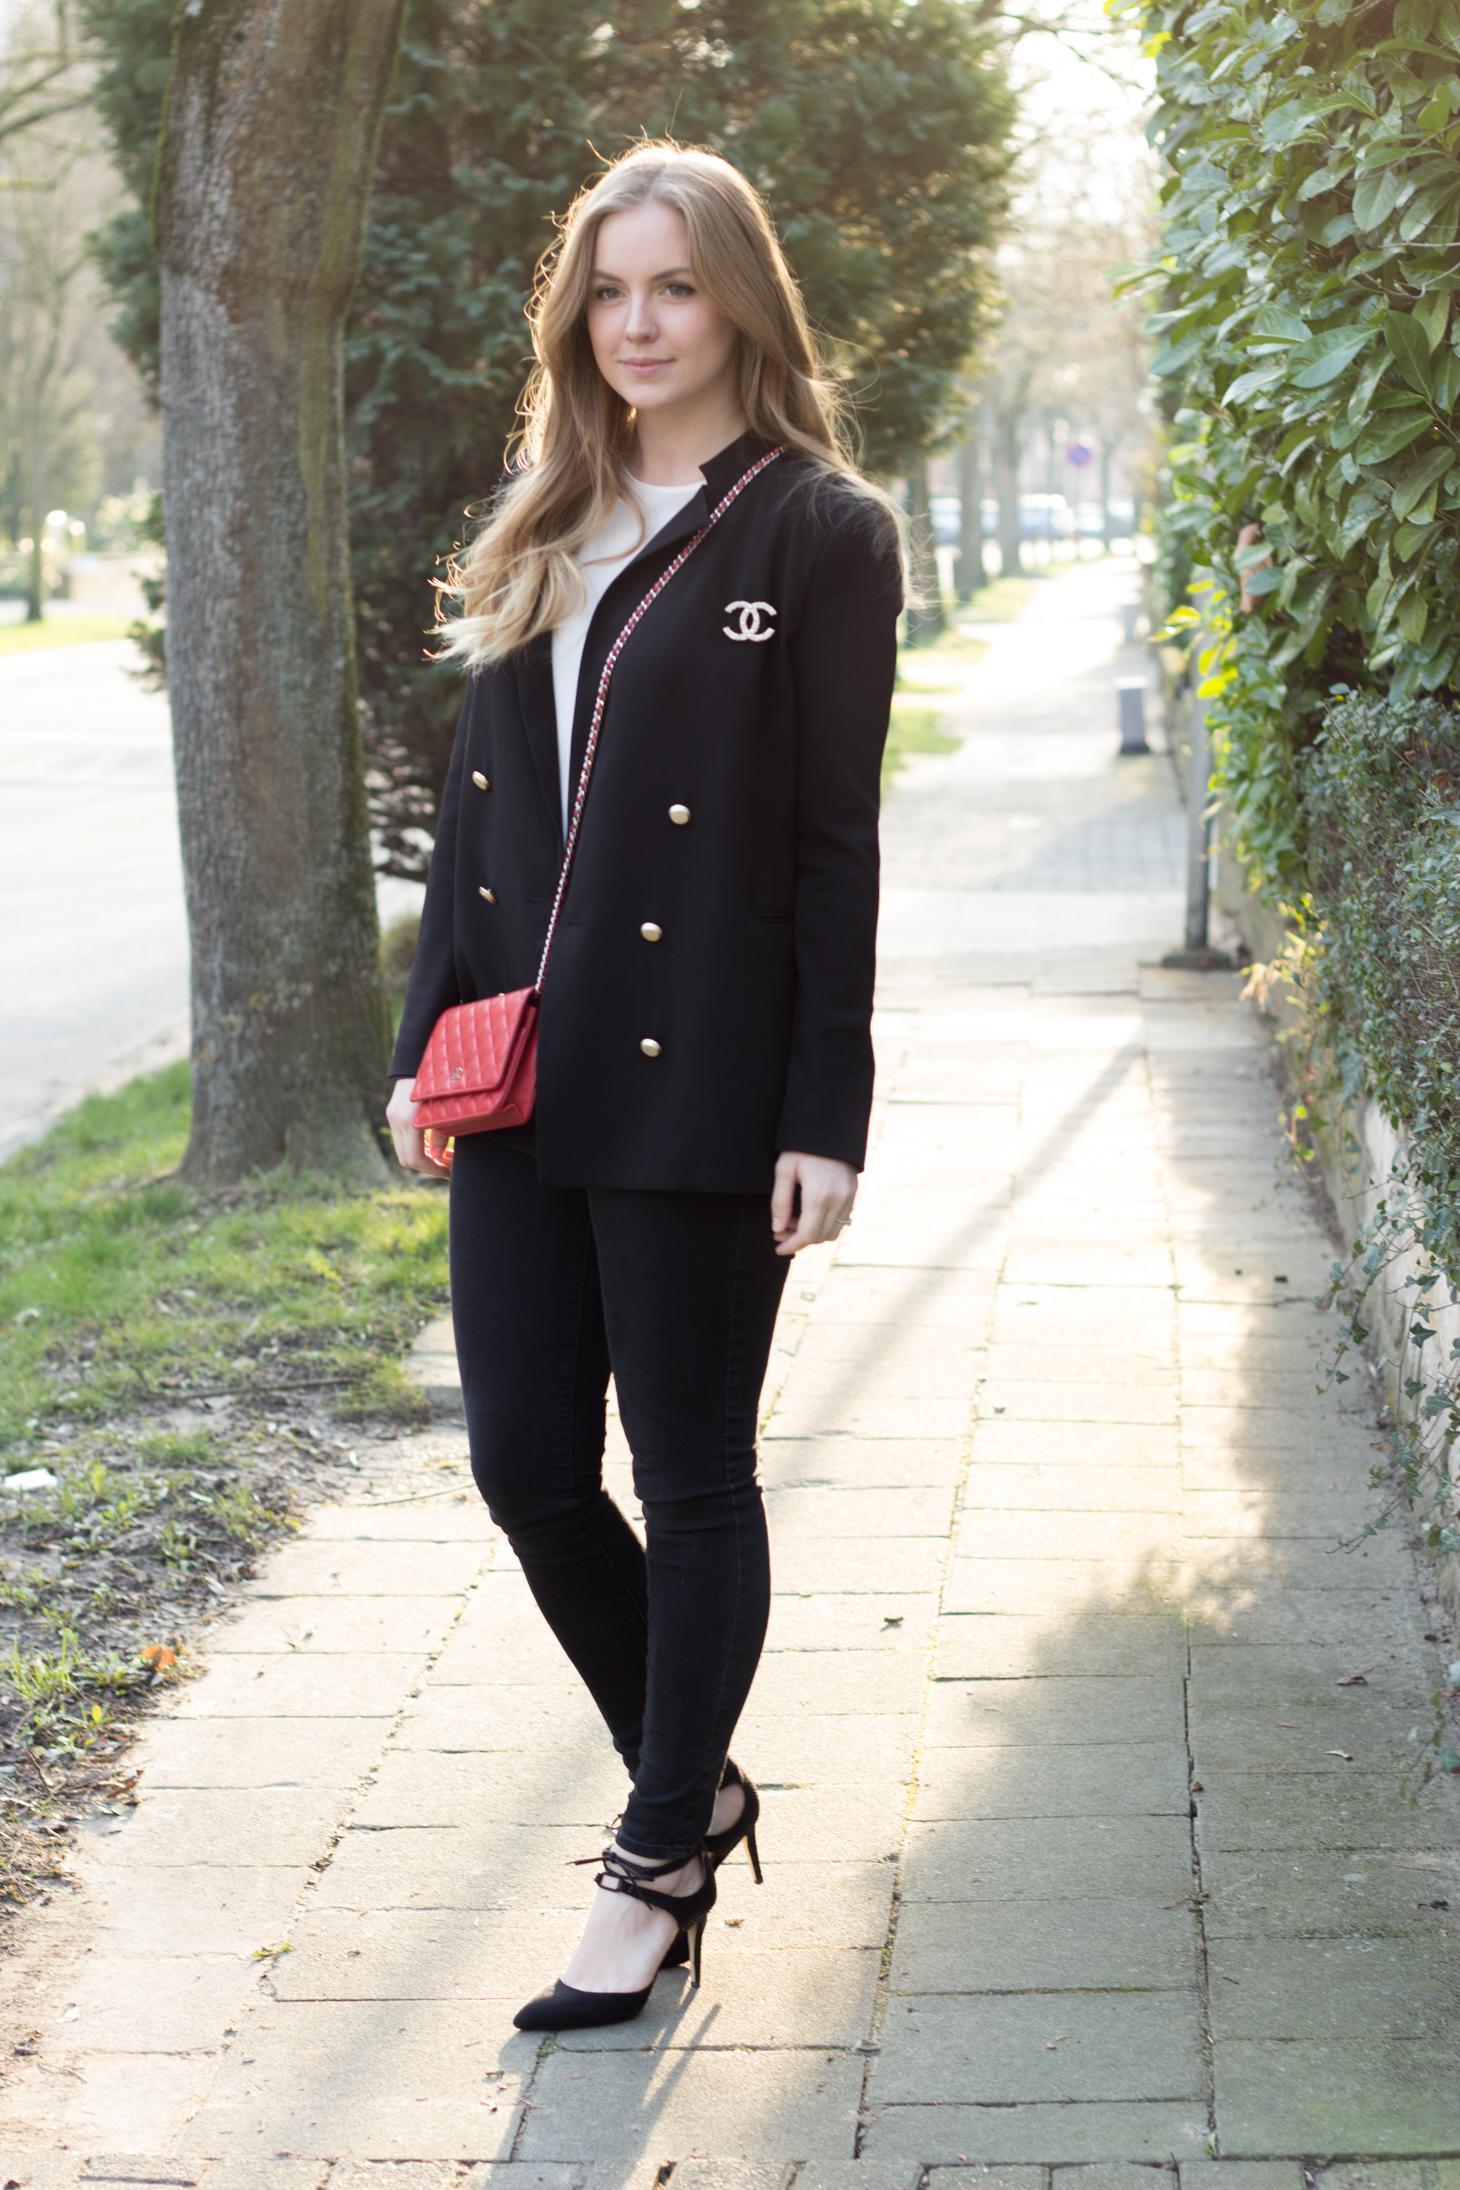 Black blazer, skinny jeans & Chanel bag